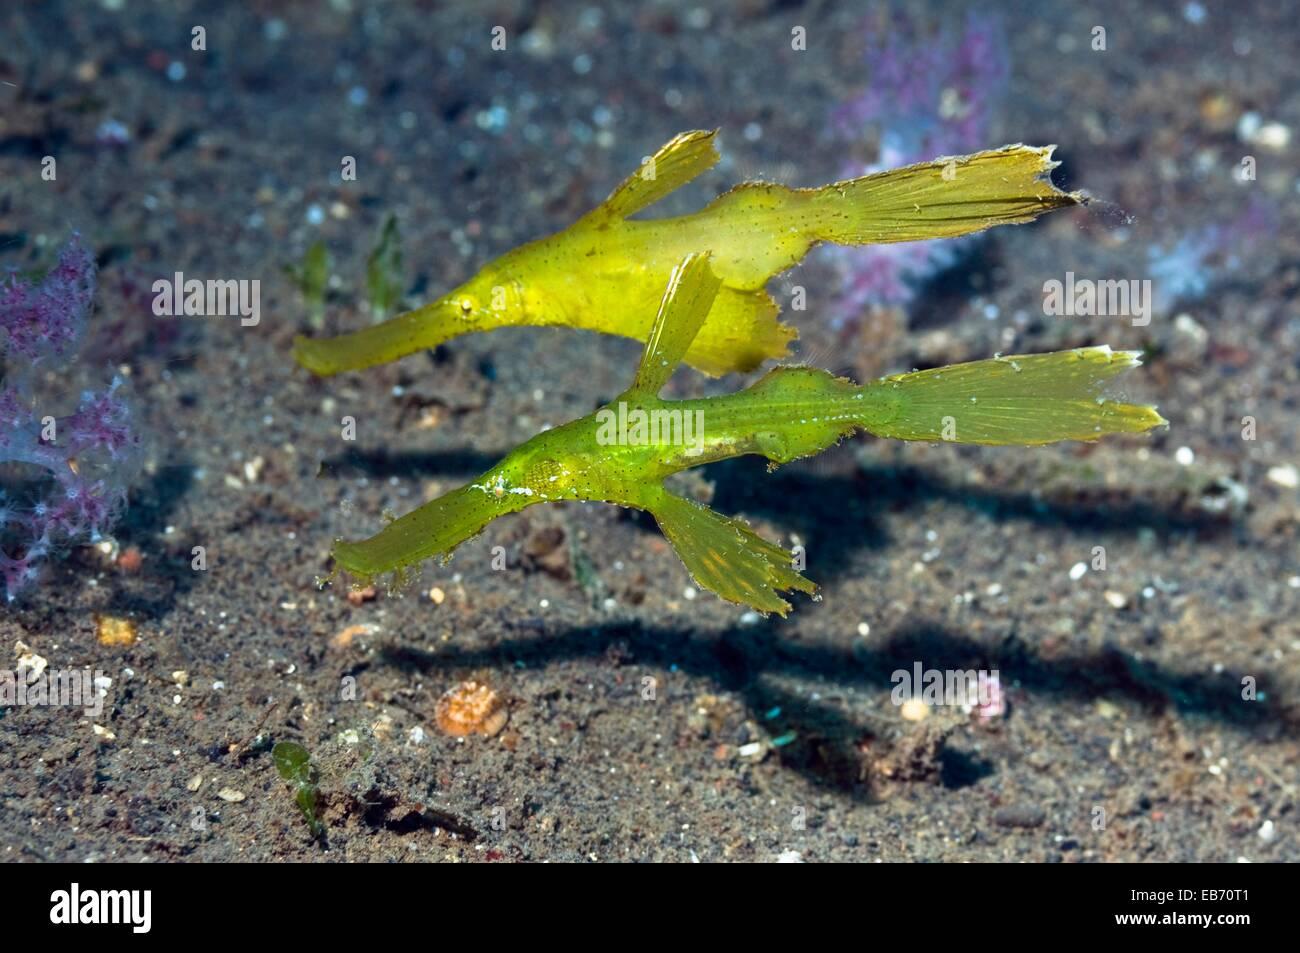 (Solenostomus cyanopterus ghostpipefish robuste), paire. Bali, Indonésie. (Saisie numérique). Photo Stock